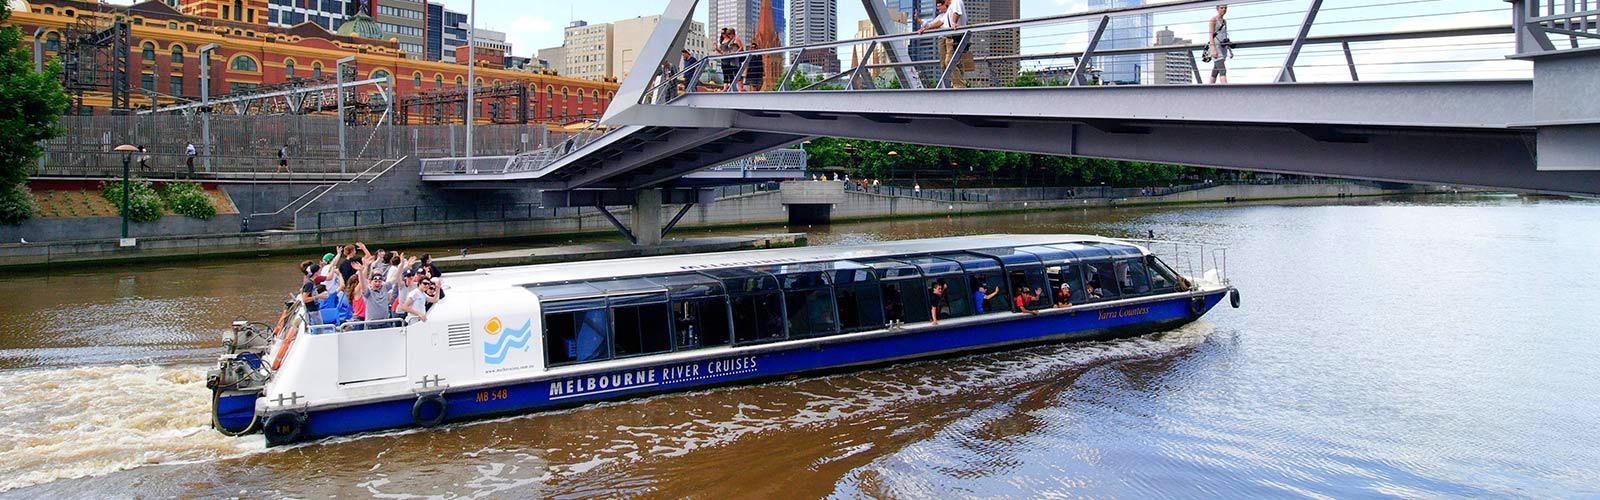 Facts about Melbourne Victoria Australia